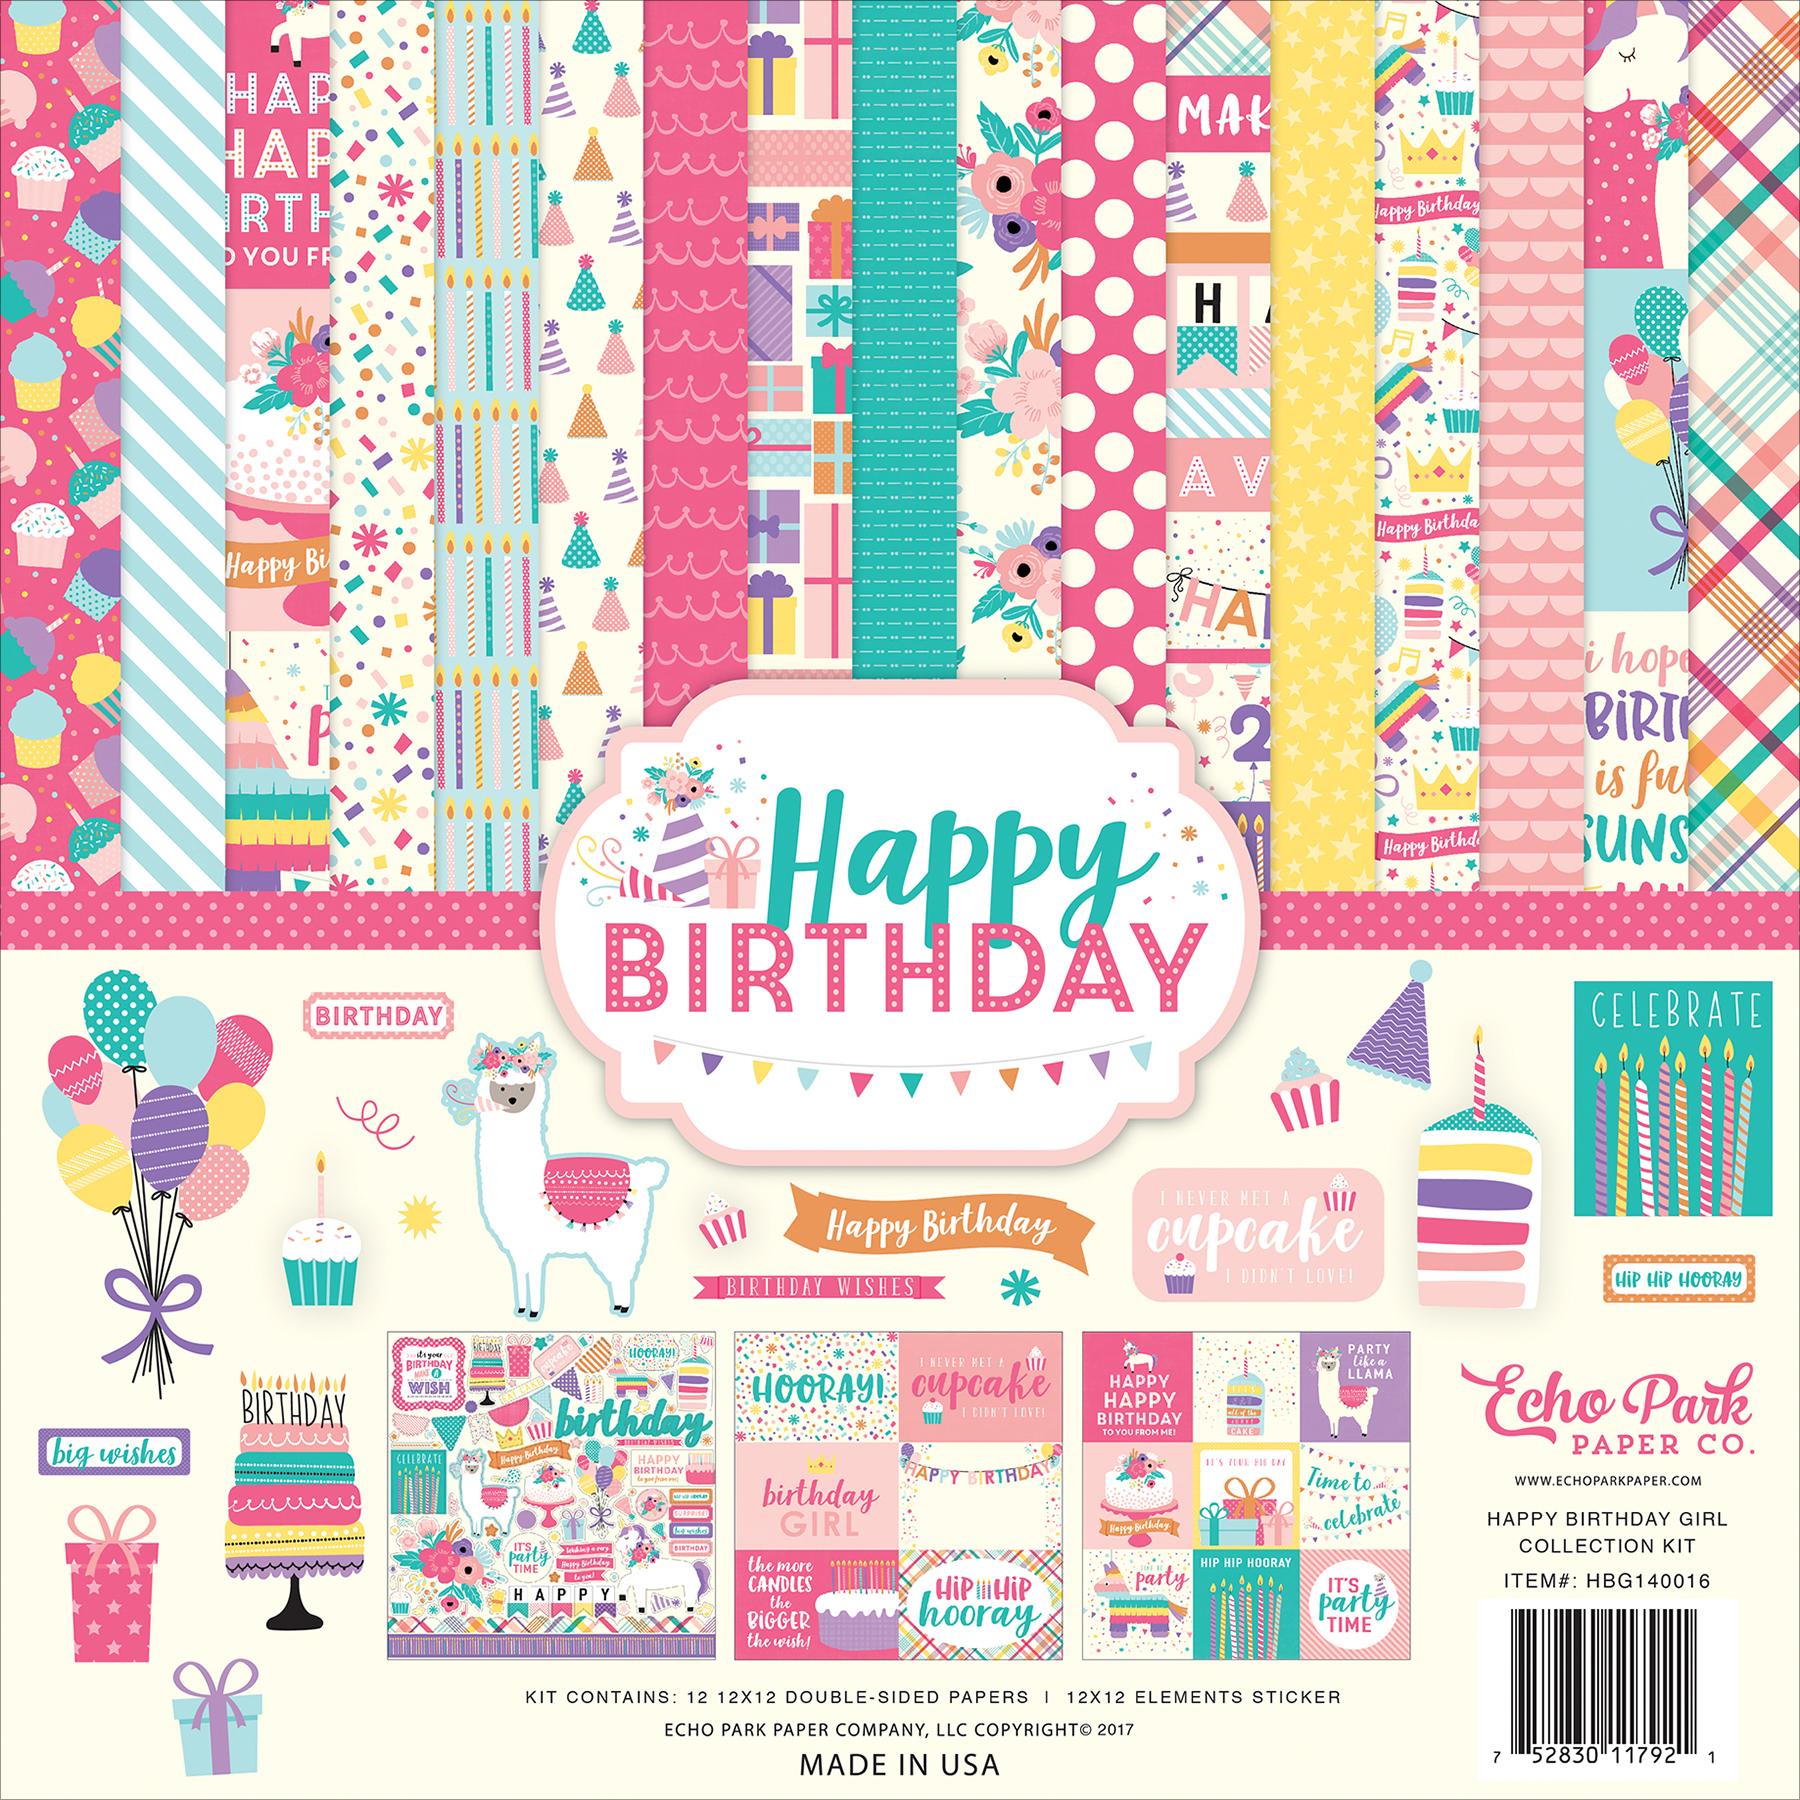 Happy Birthday Girl - Echo Park Collection Kit 12X12